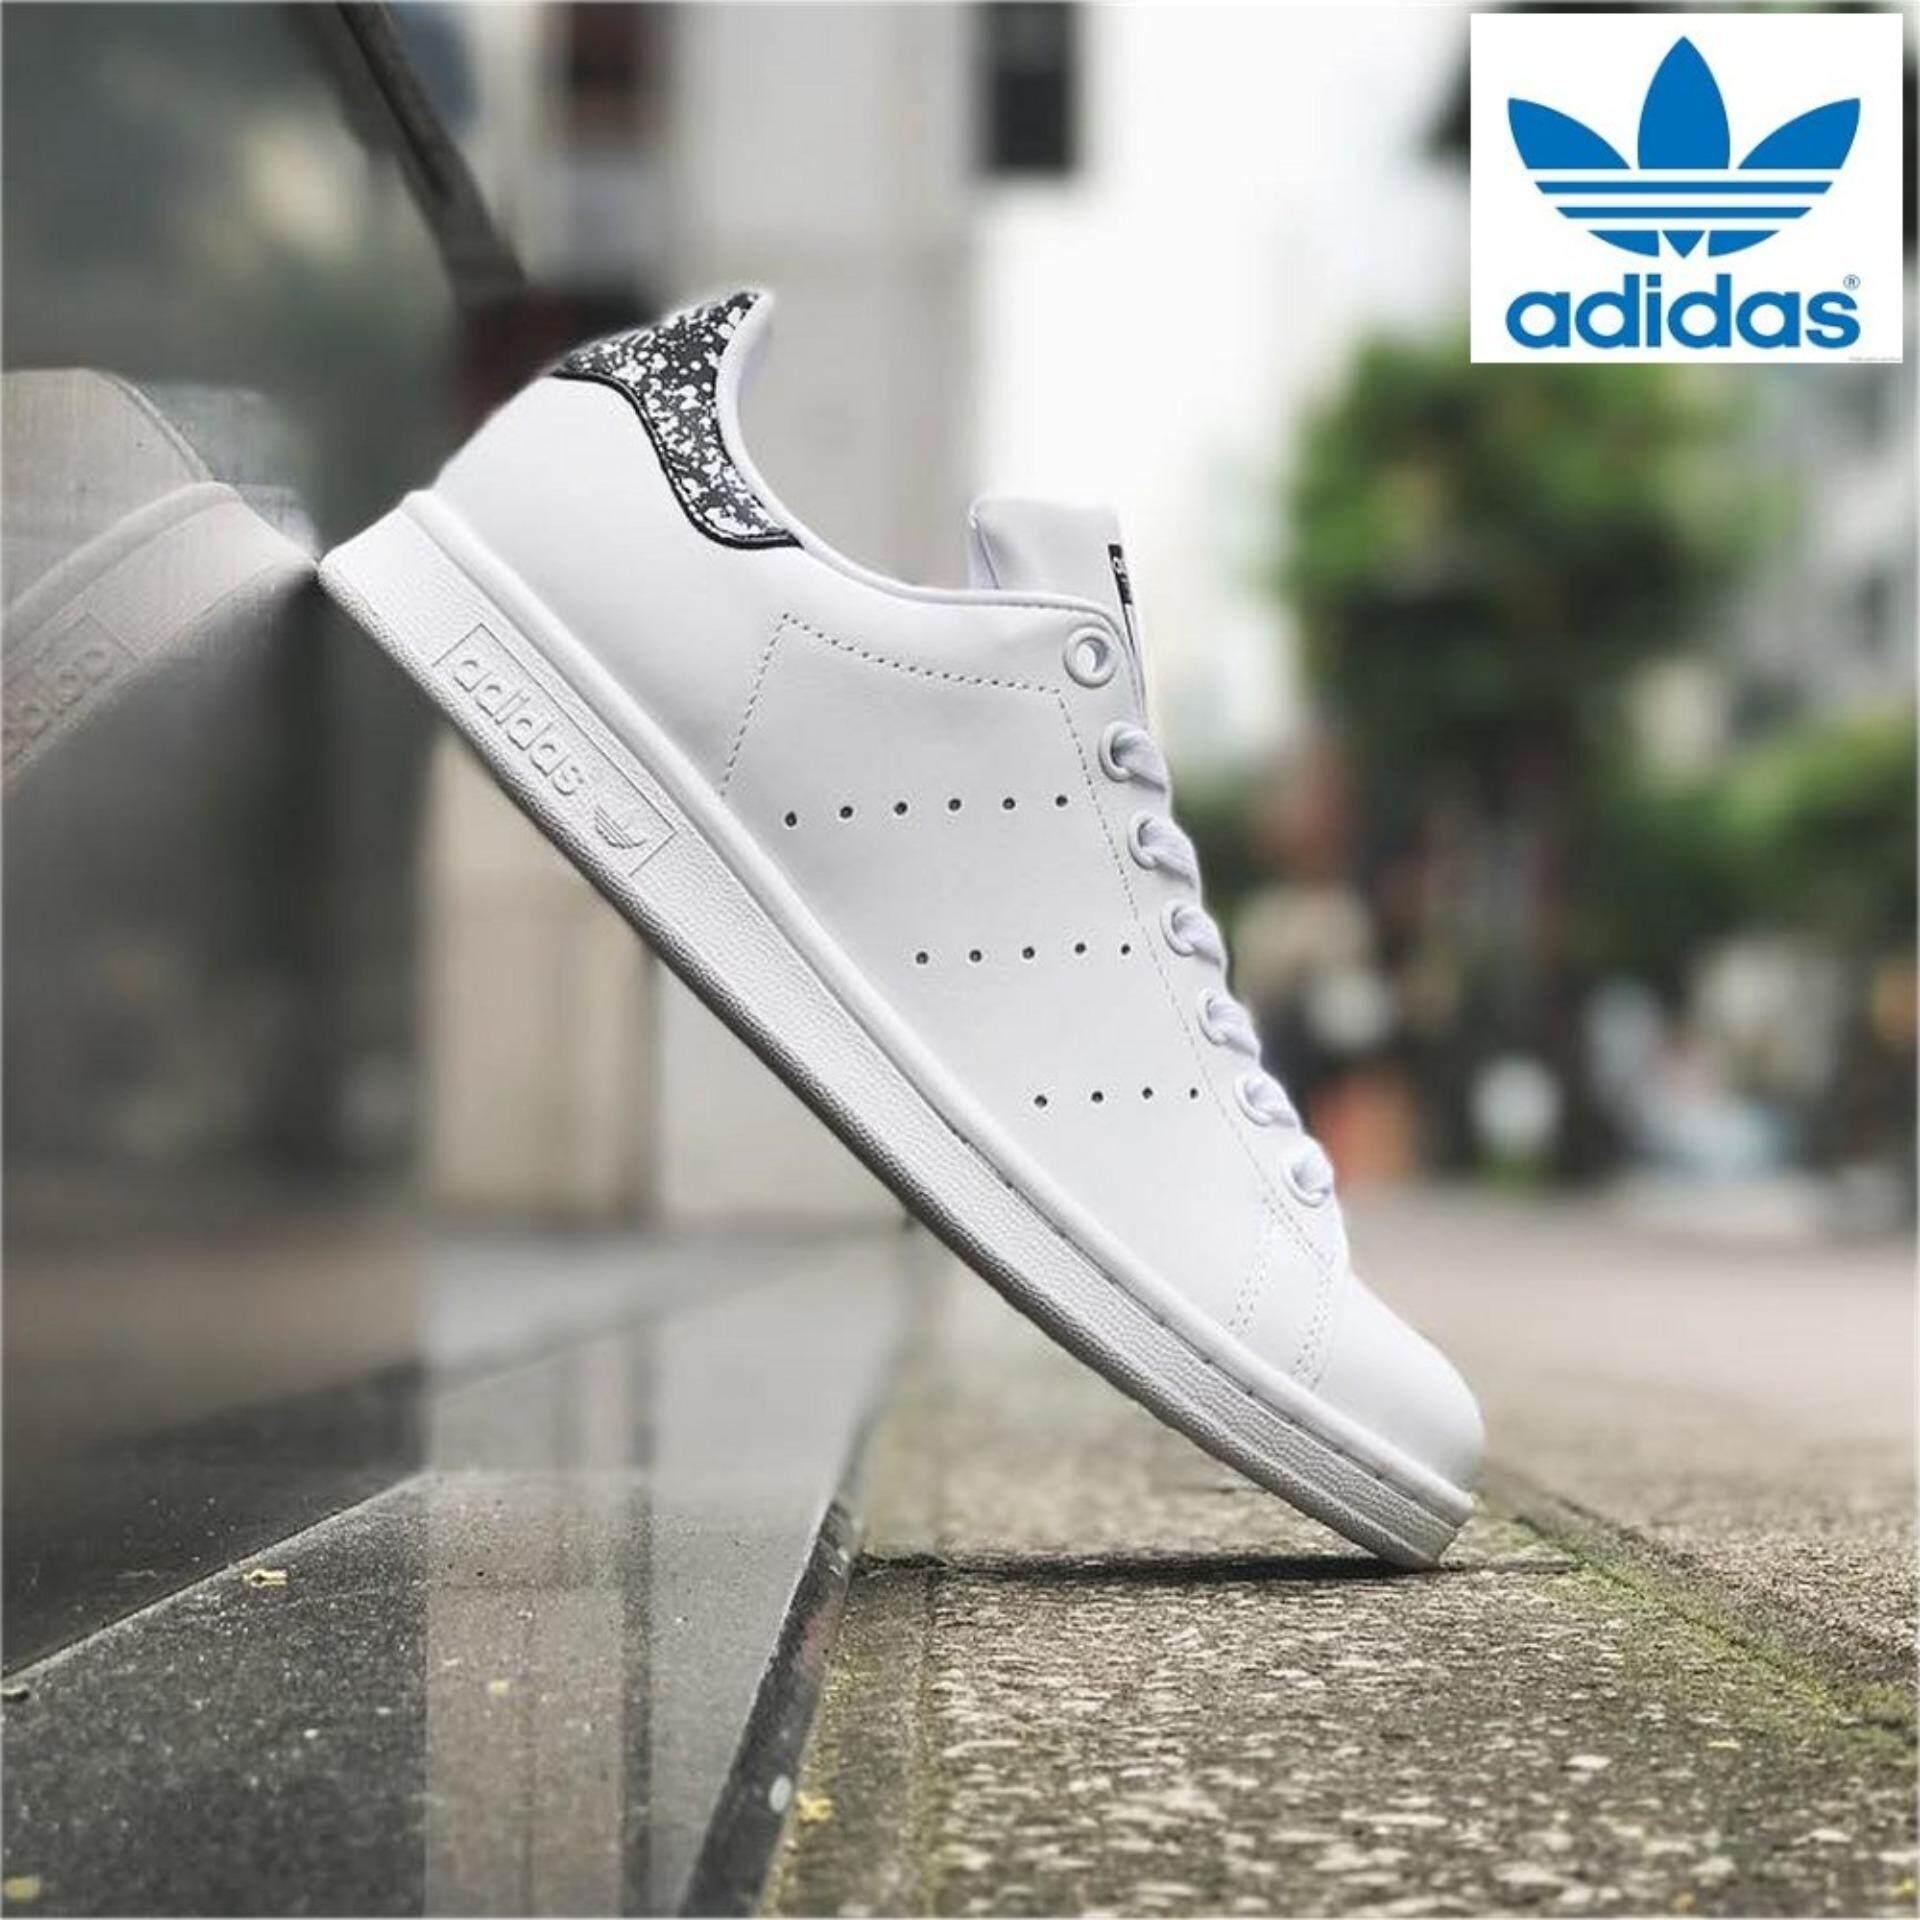 eca8218e14b2 Adidas Women s Originals Stan Smith Shoes BZ0408 White Black Splatter